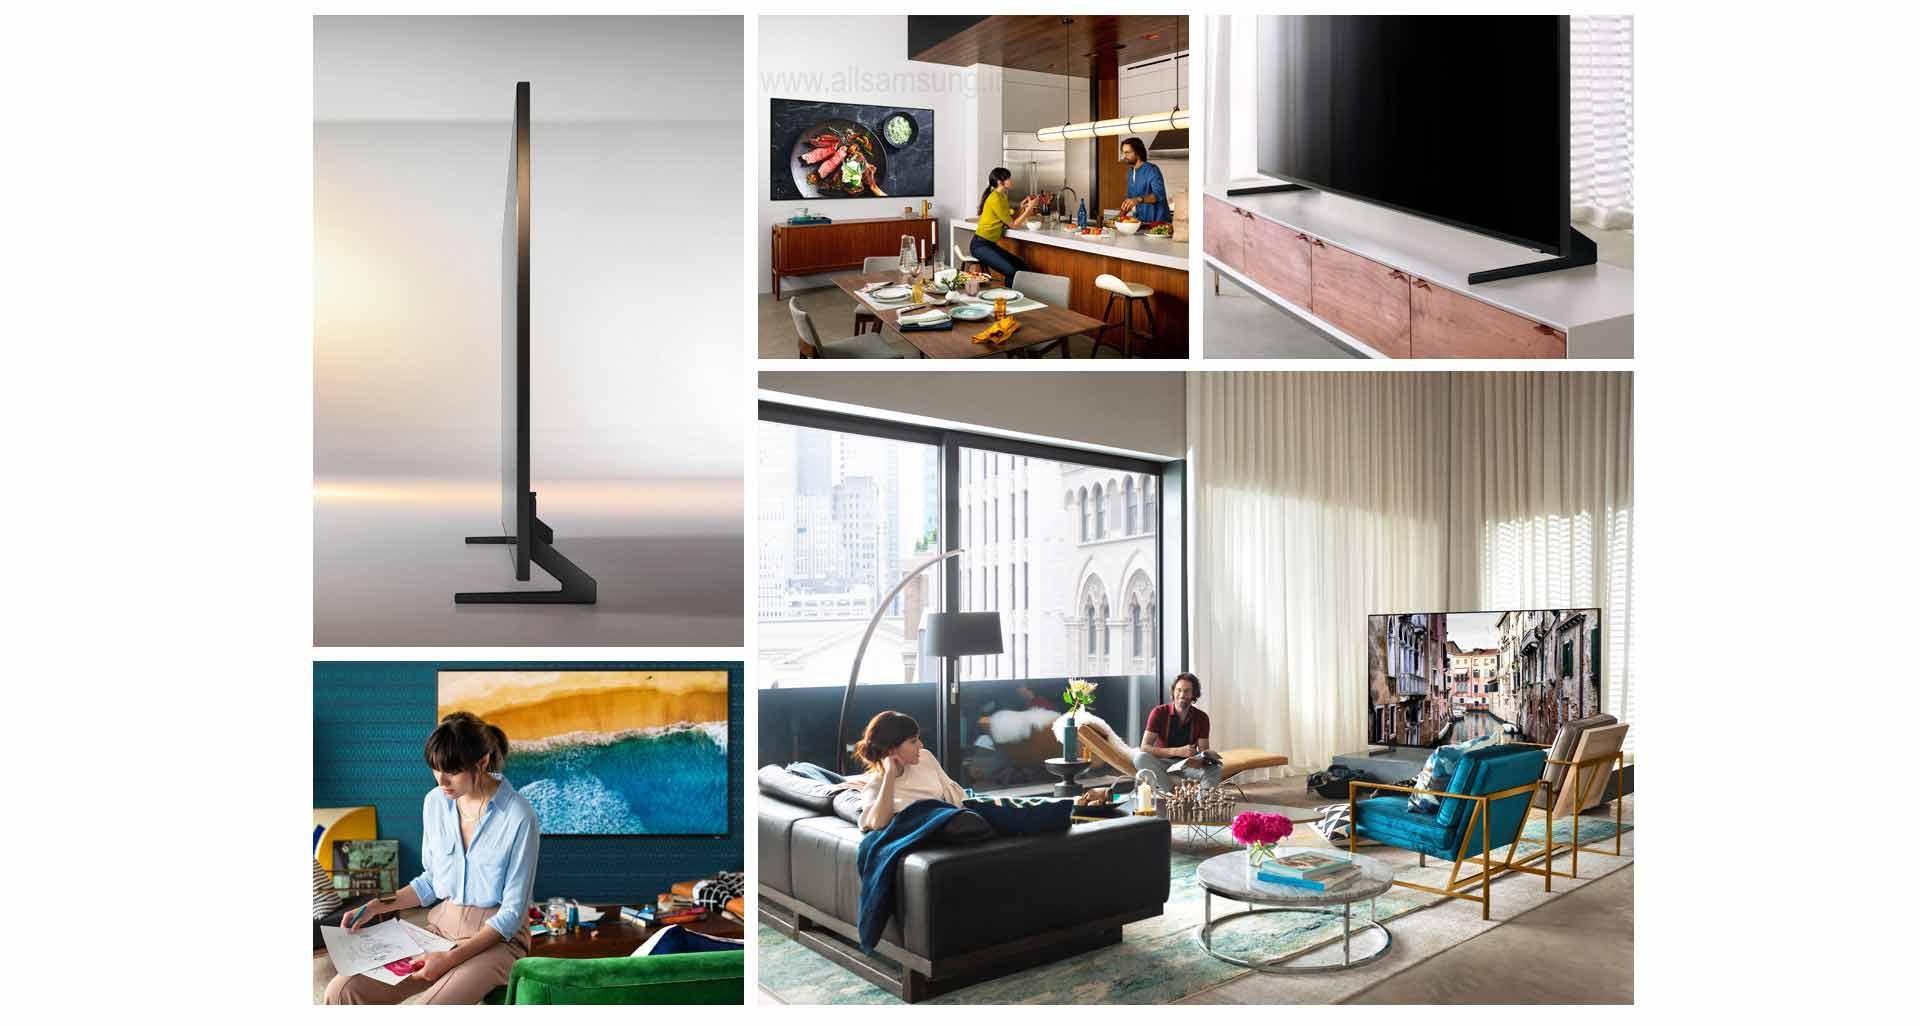 طراحی هنرمندانه تلویزیون کیو ال ای دی Q900R